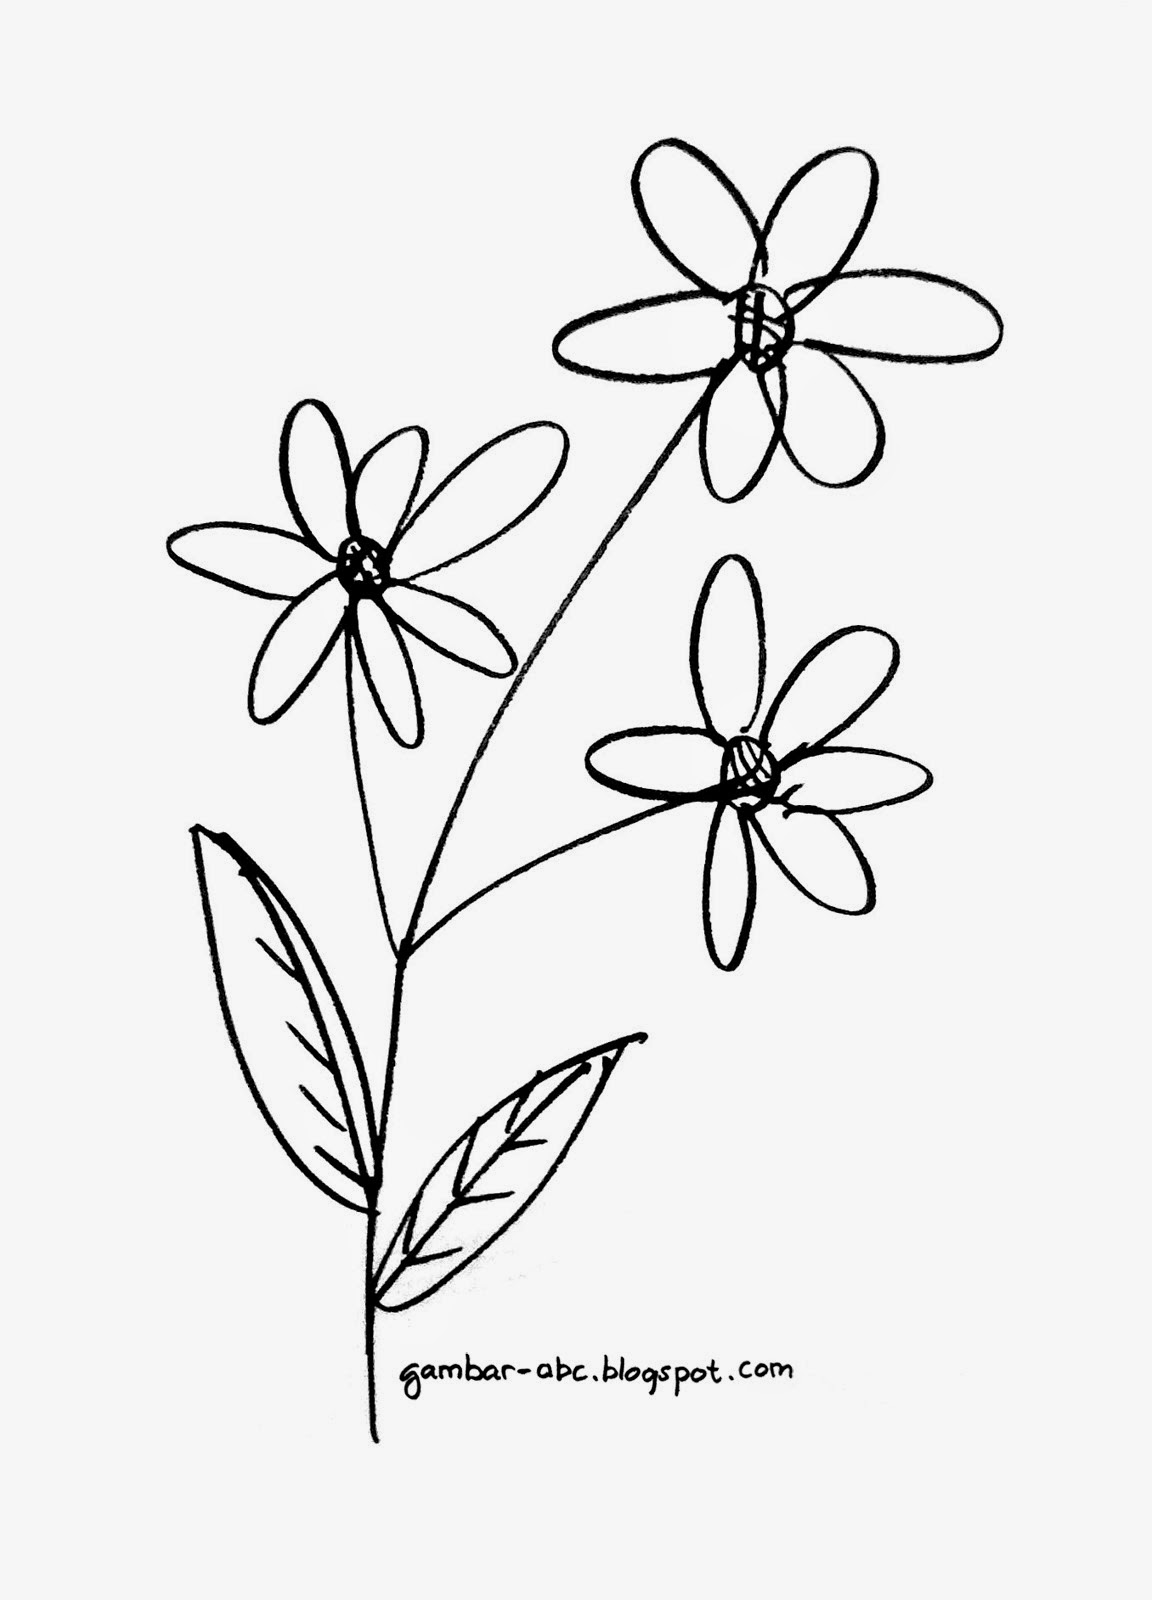 37 Contoh Gambar Bunga Cantik Yg Untk Di Gambar Inspirasi Penting